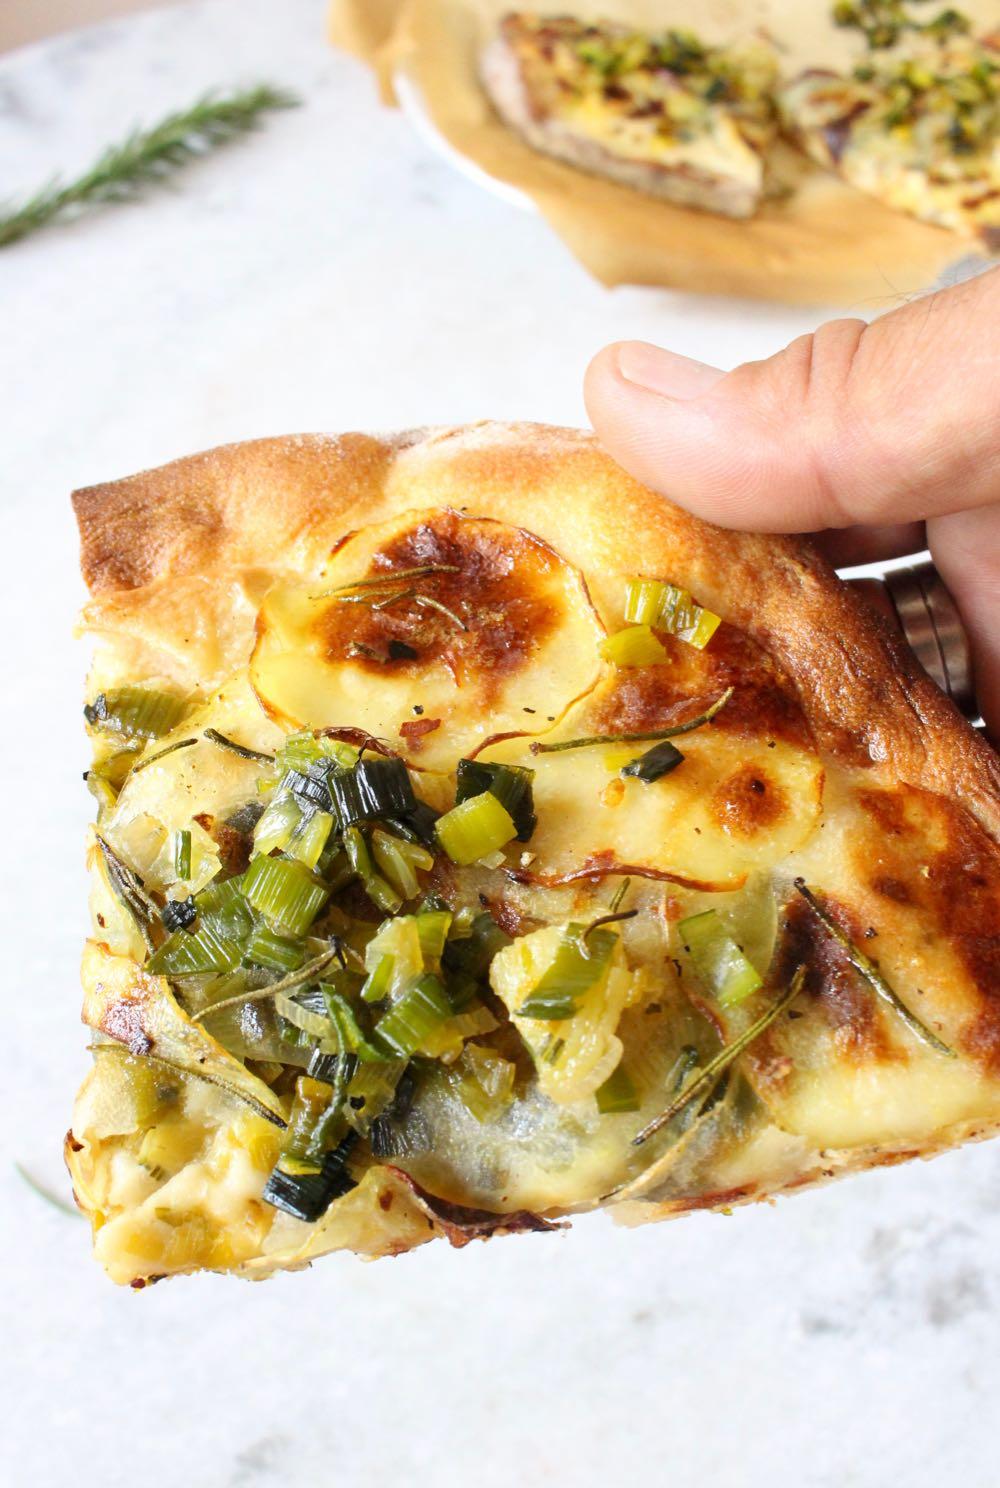 Thin crust slice of potato pizza